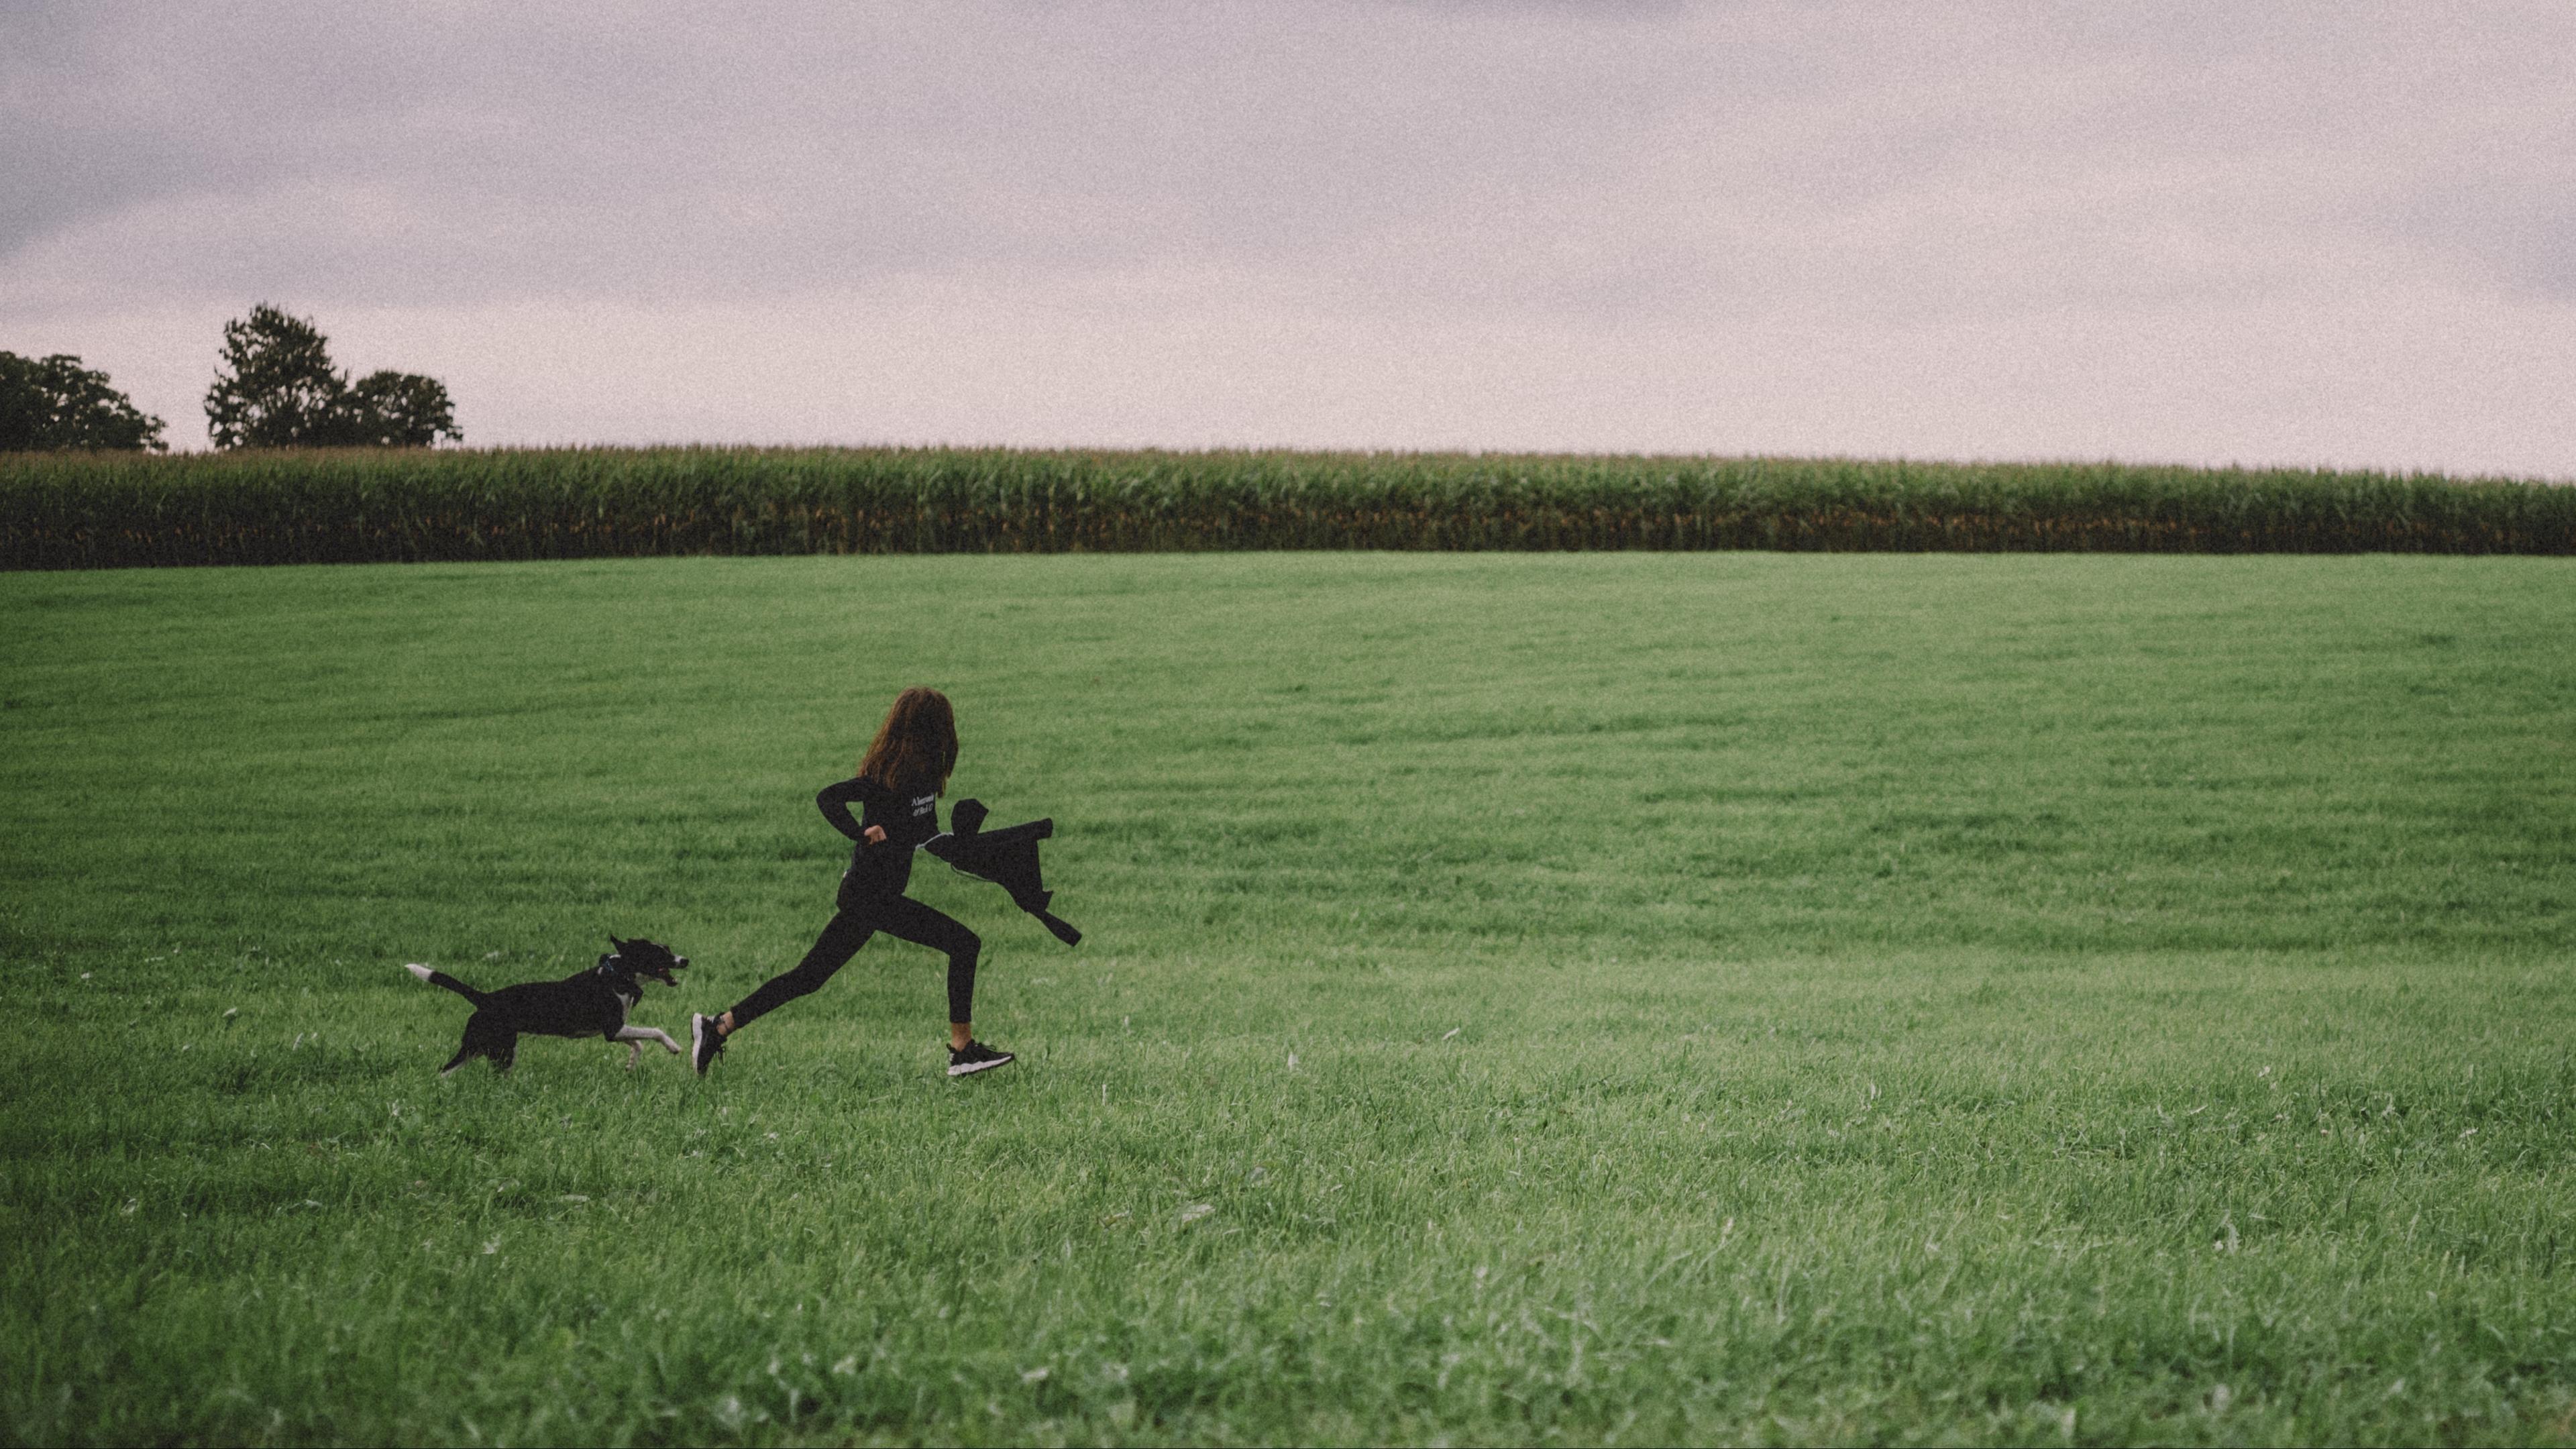 girl dog walk field 4k 1541116672 - girl, dog, walk, field 4k - walk, Girl, Dog